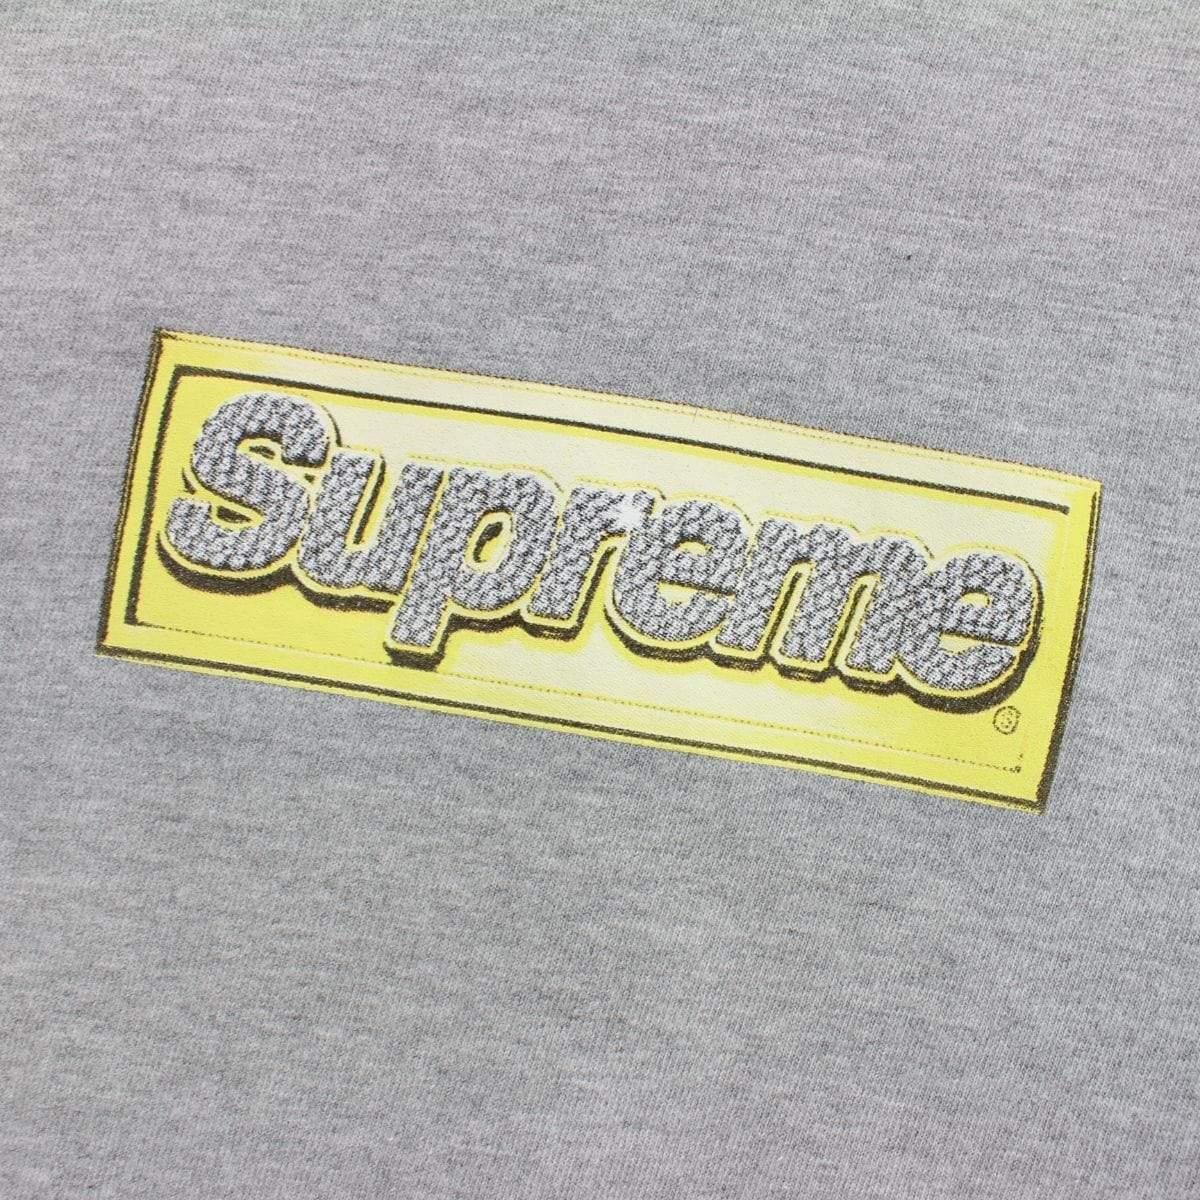 supreme bling box logo tee real vs fake